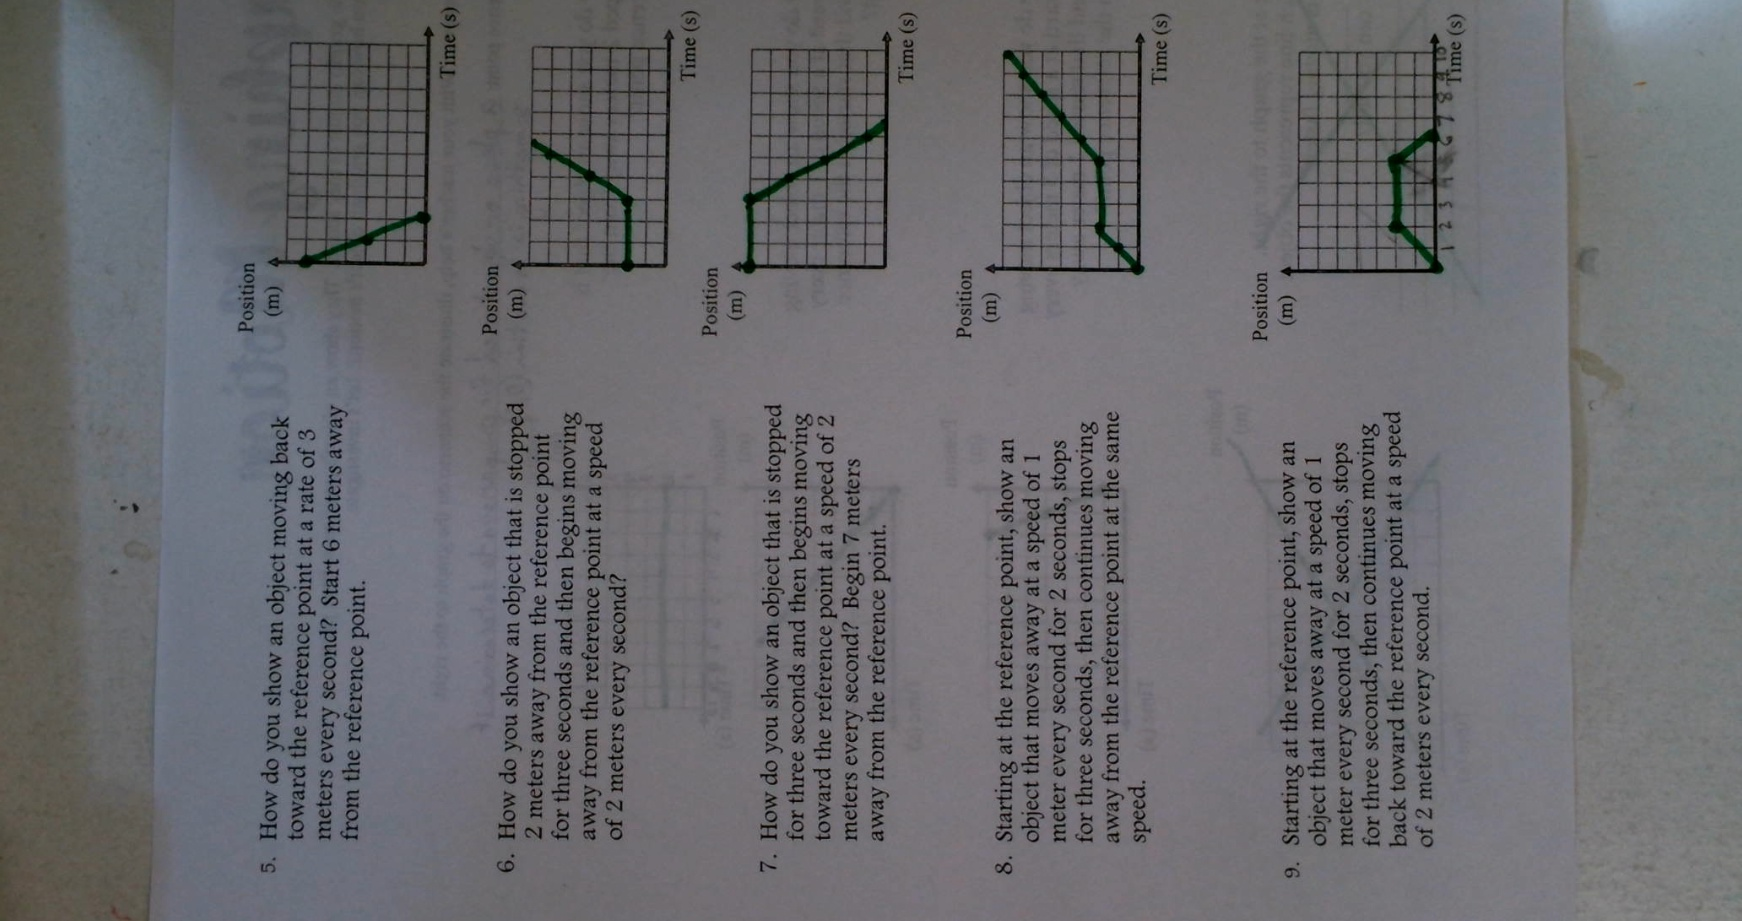 Pysher Richard Daily Agenda Classwork Homework And